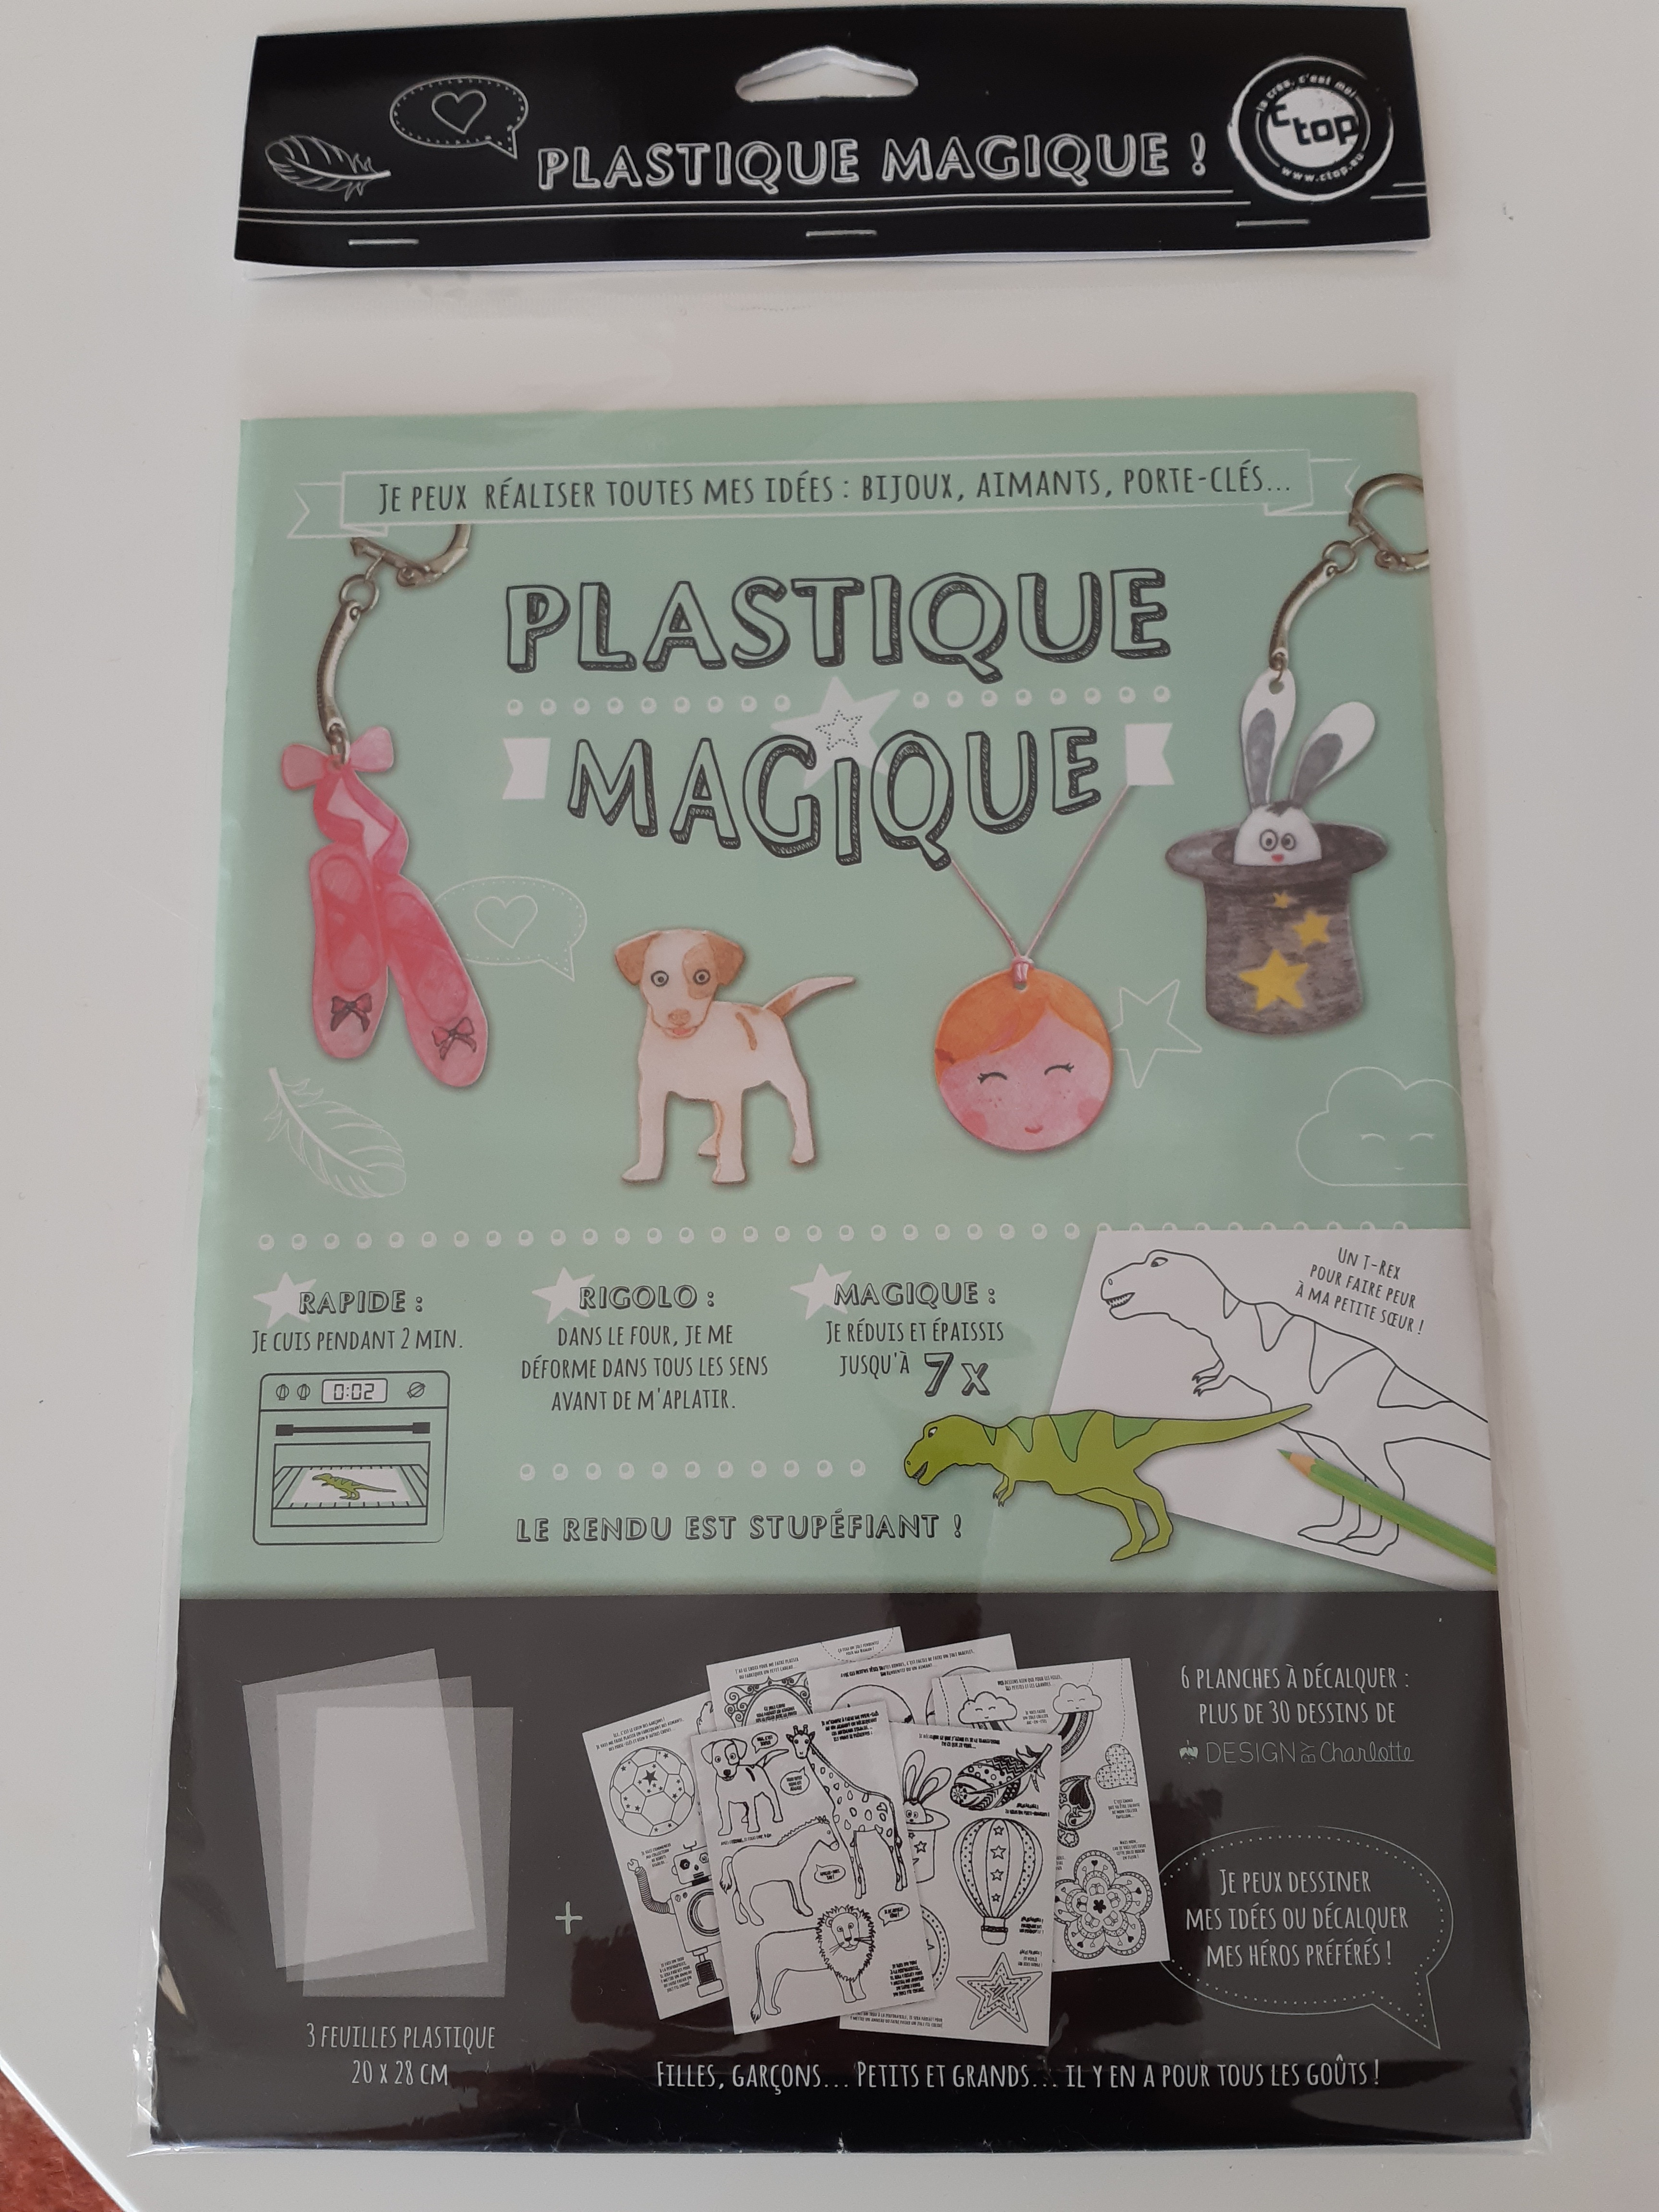 Plastique magique